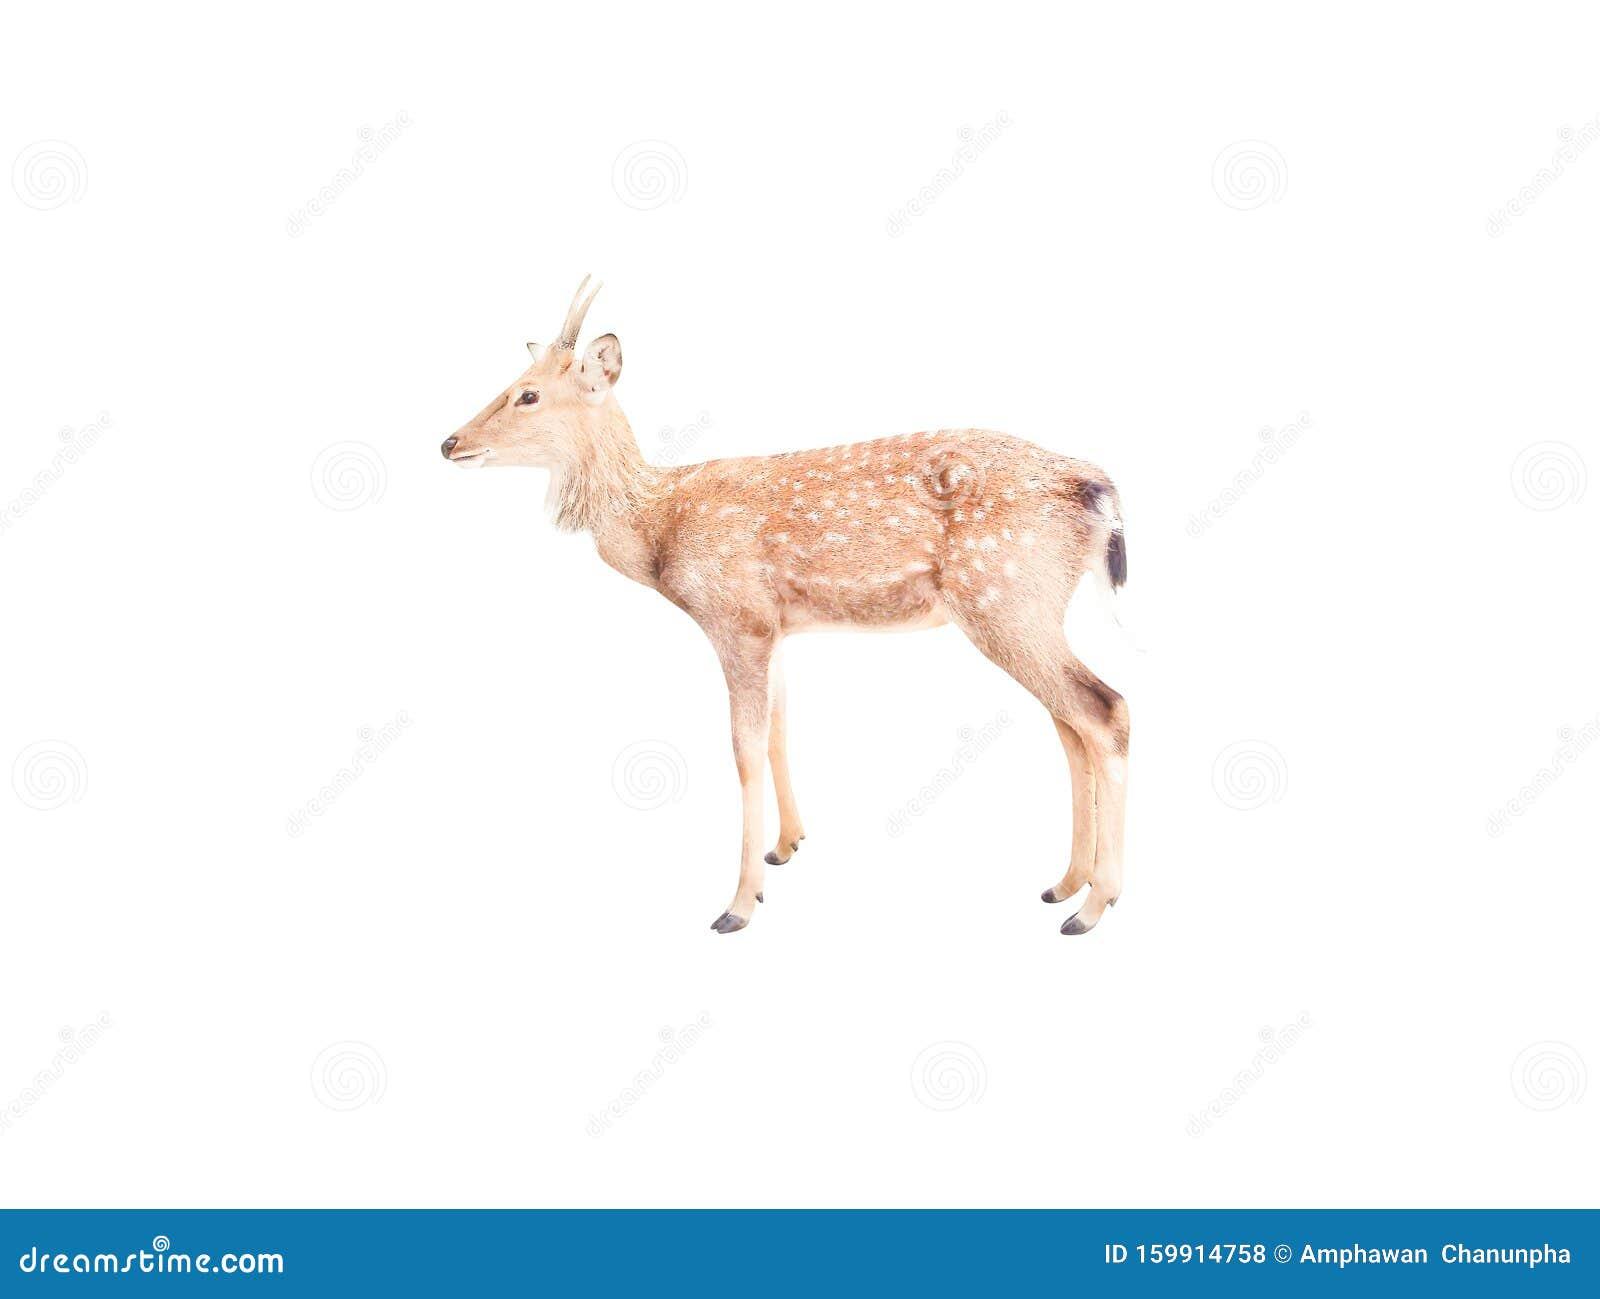 Single horn deer